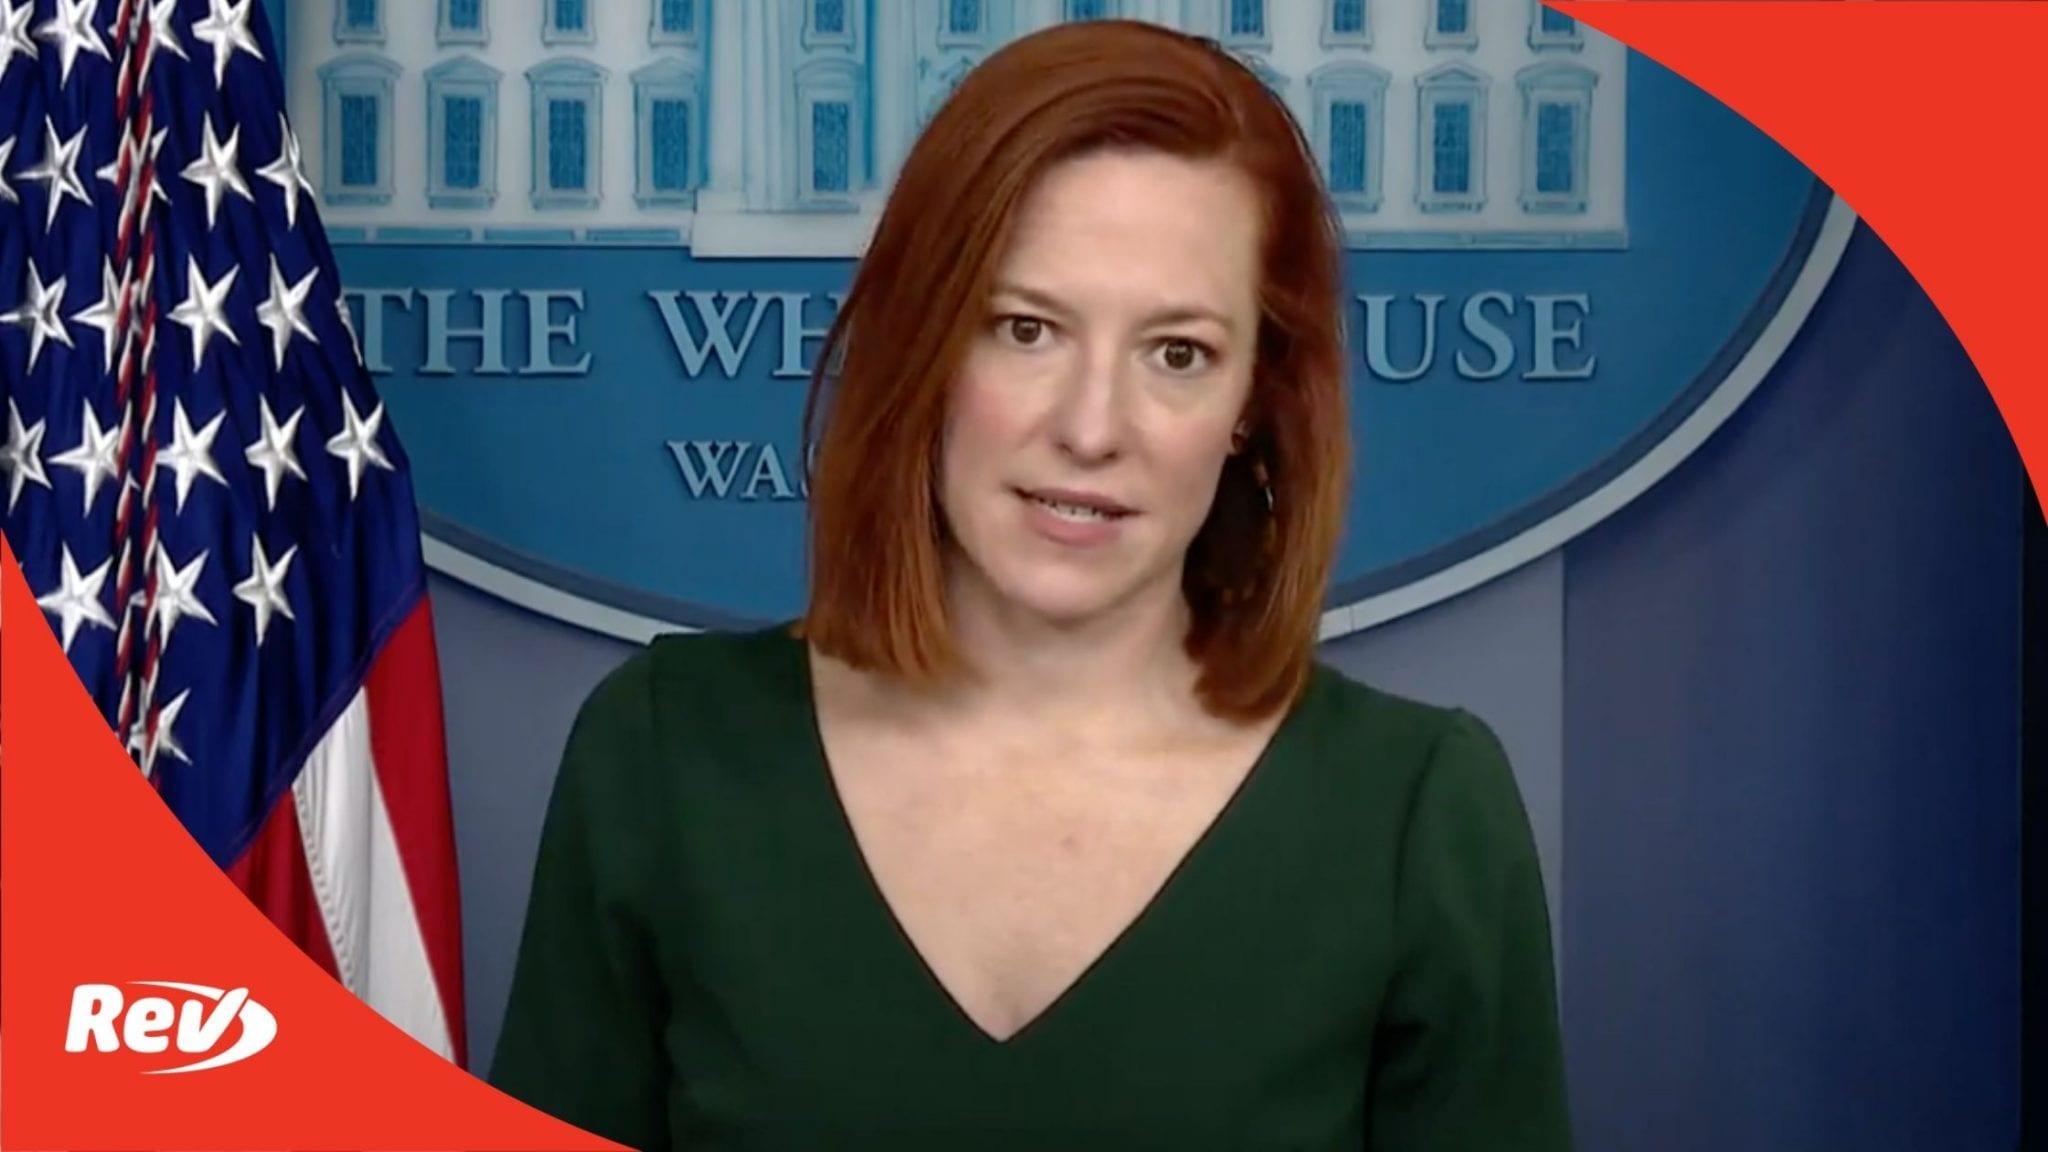 Press Secretary Jen Psaki White House Press Conference Transcript February 25